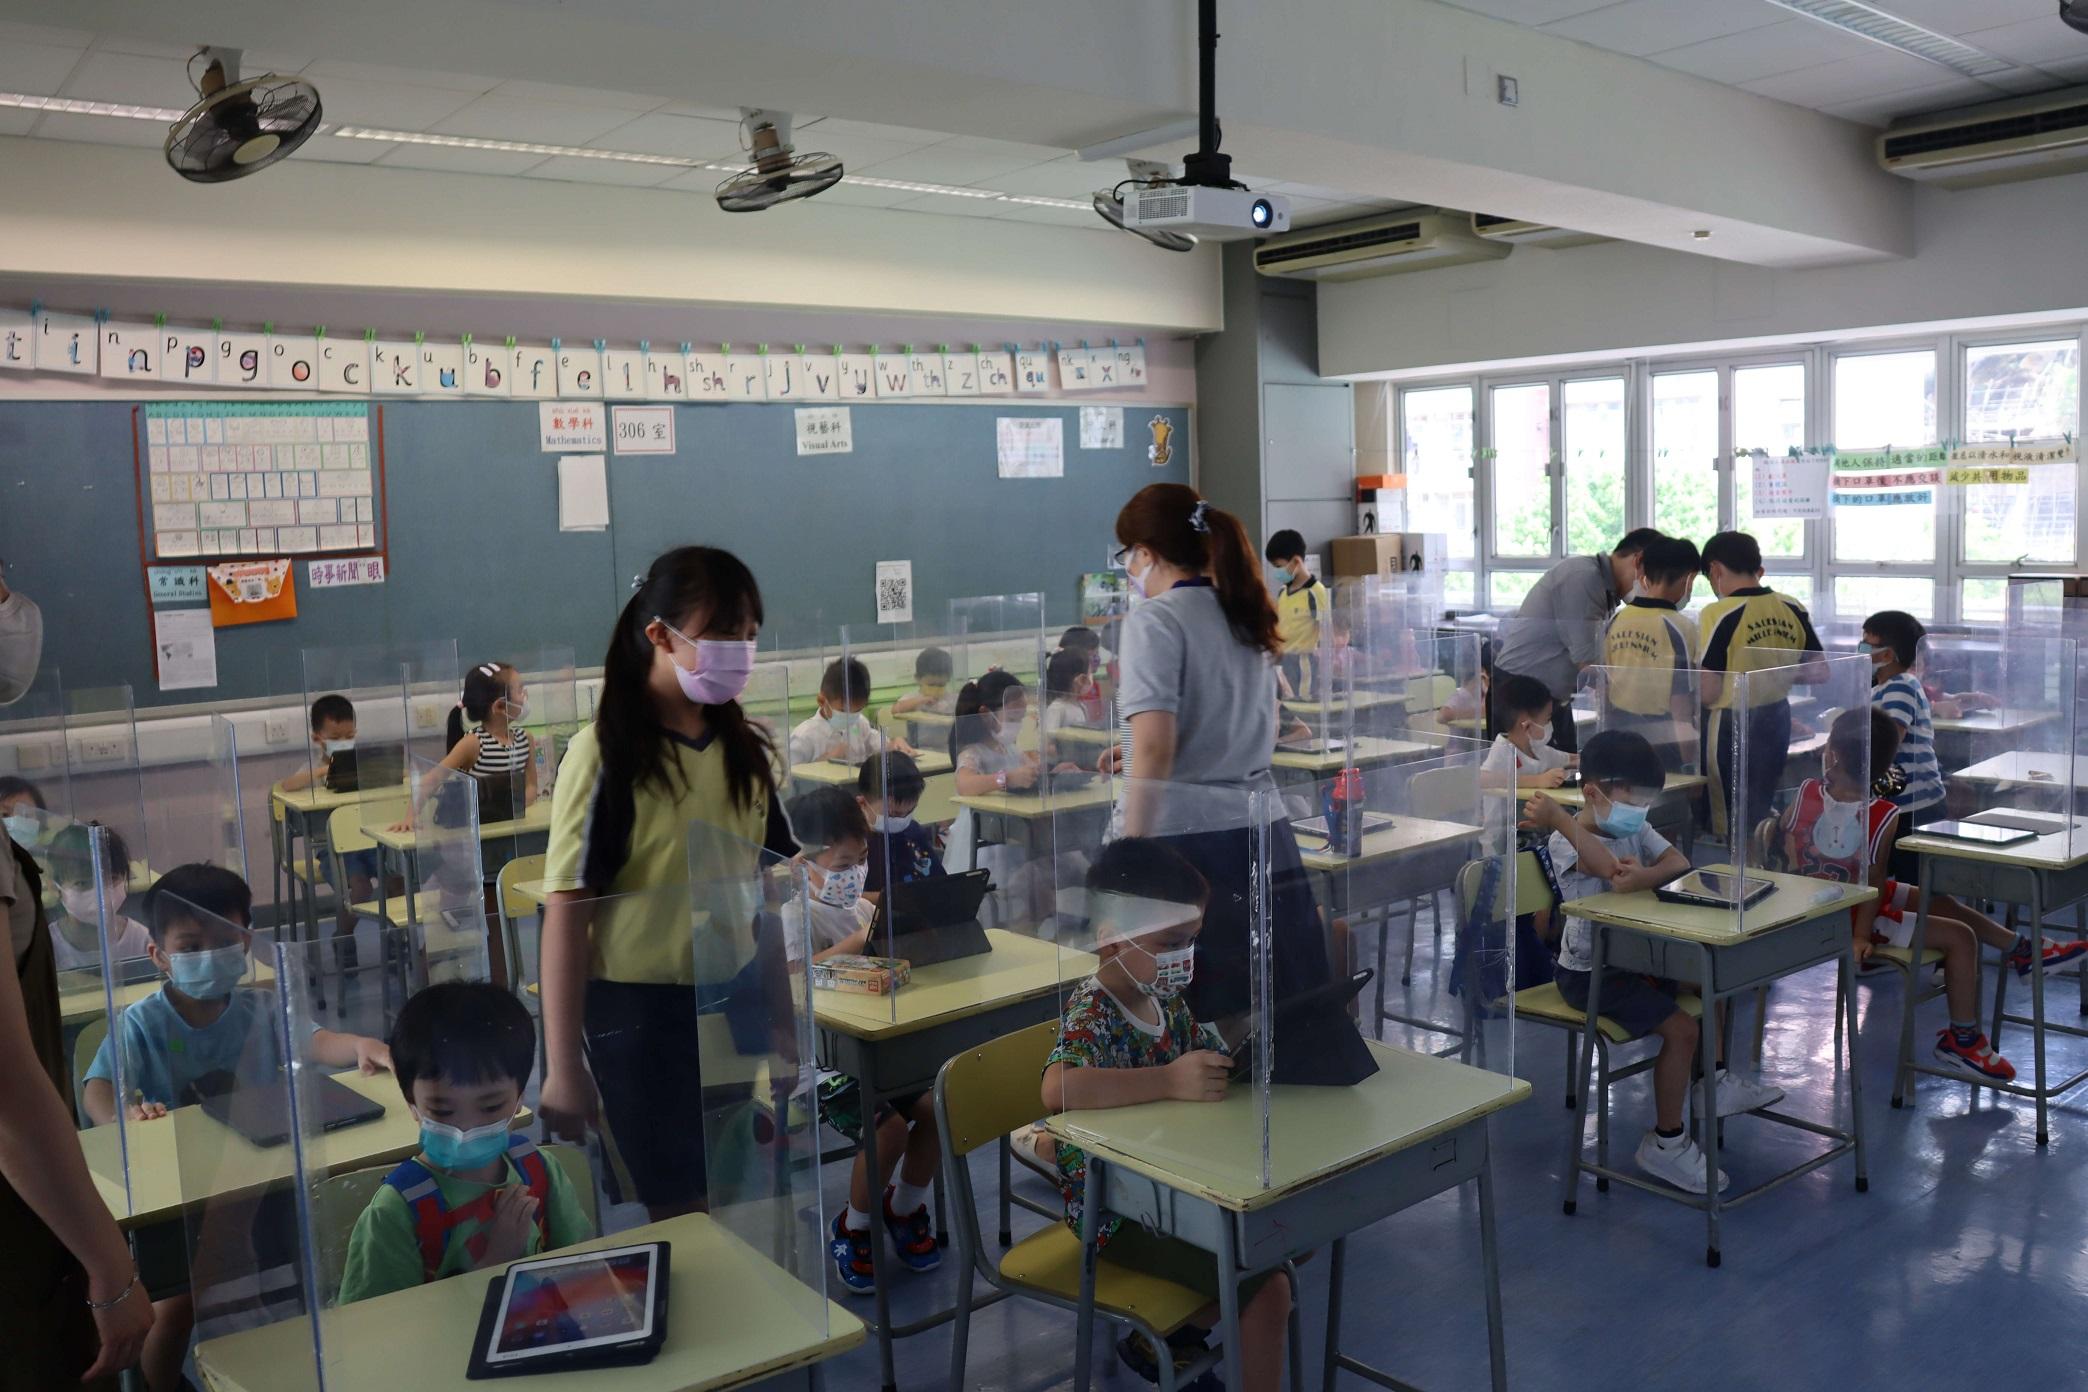 https://syh.edu.hk/sites/default/files/img_112_4.jpg